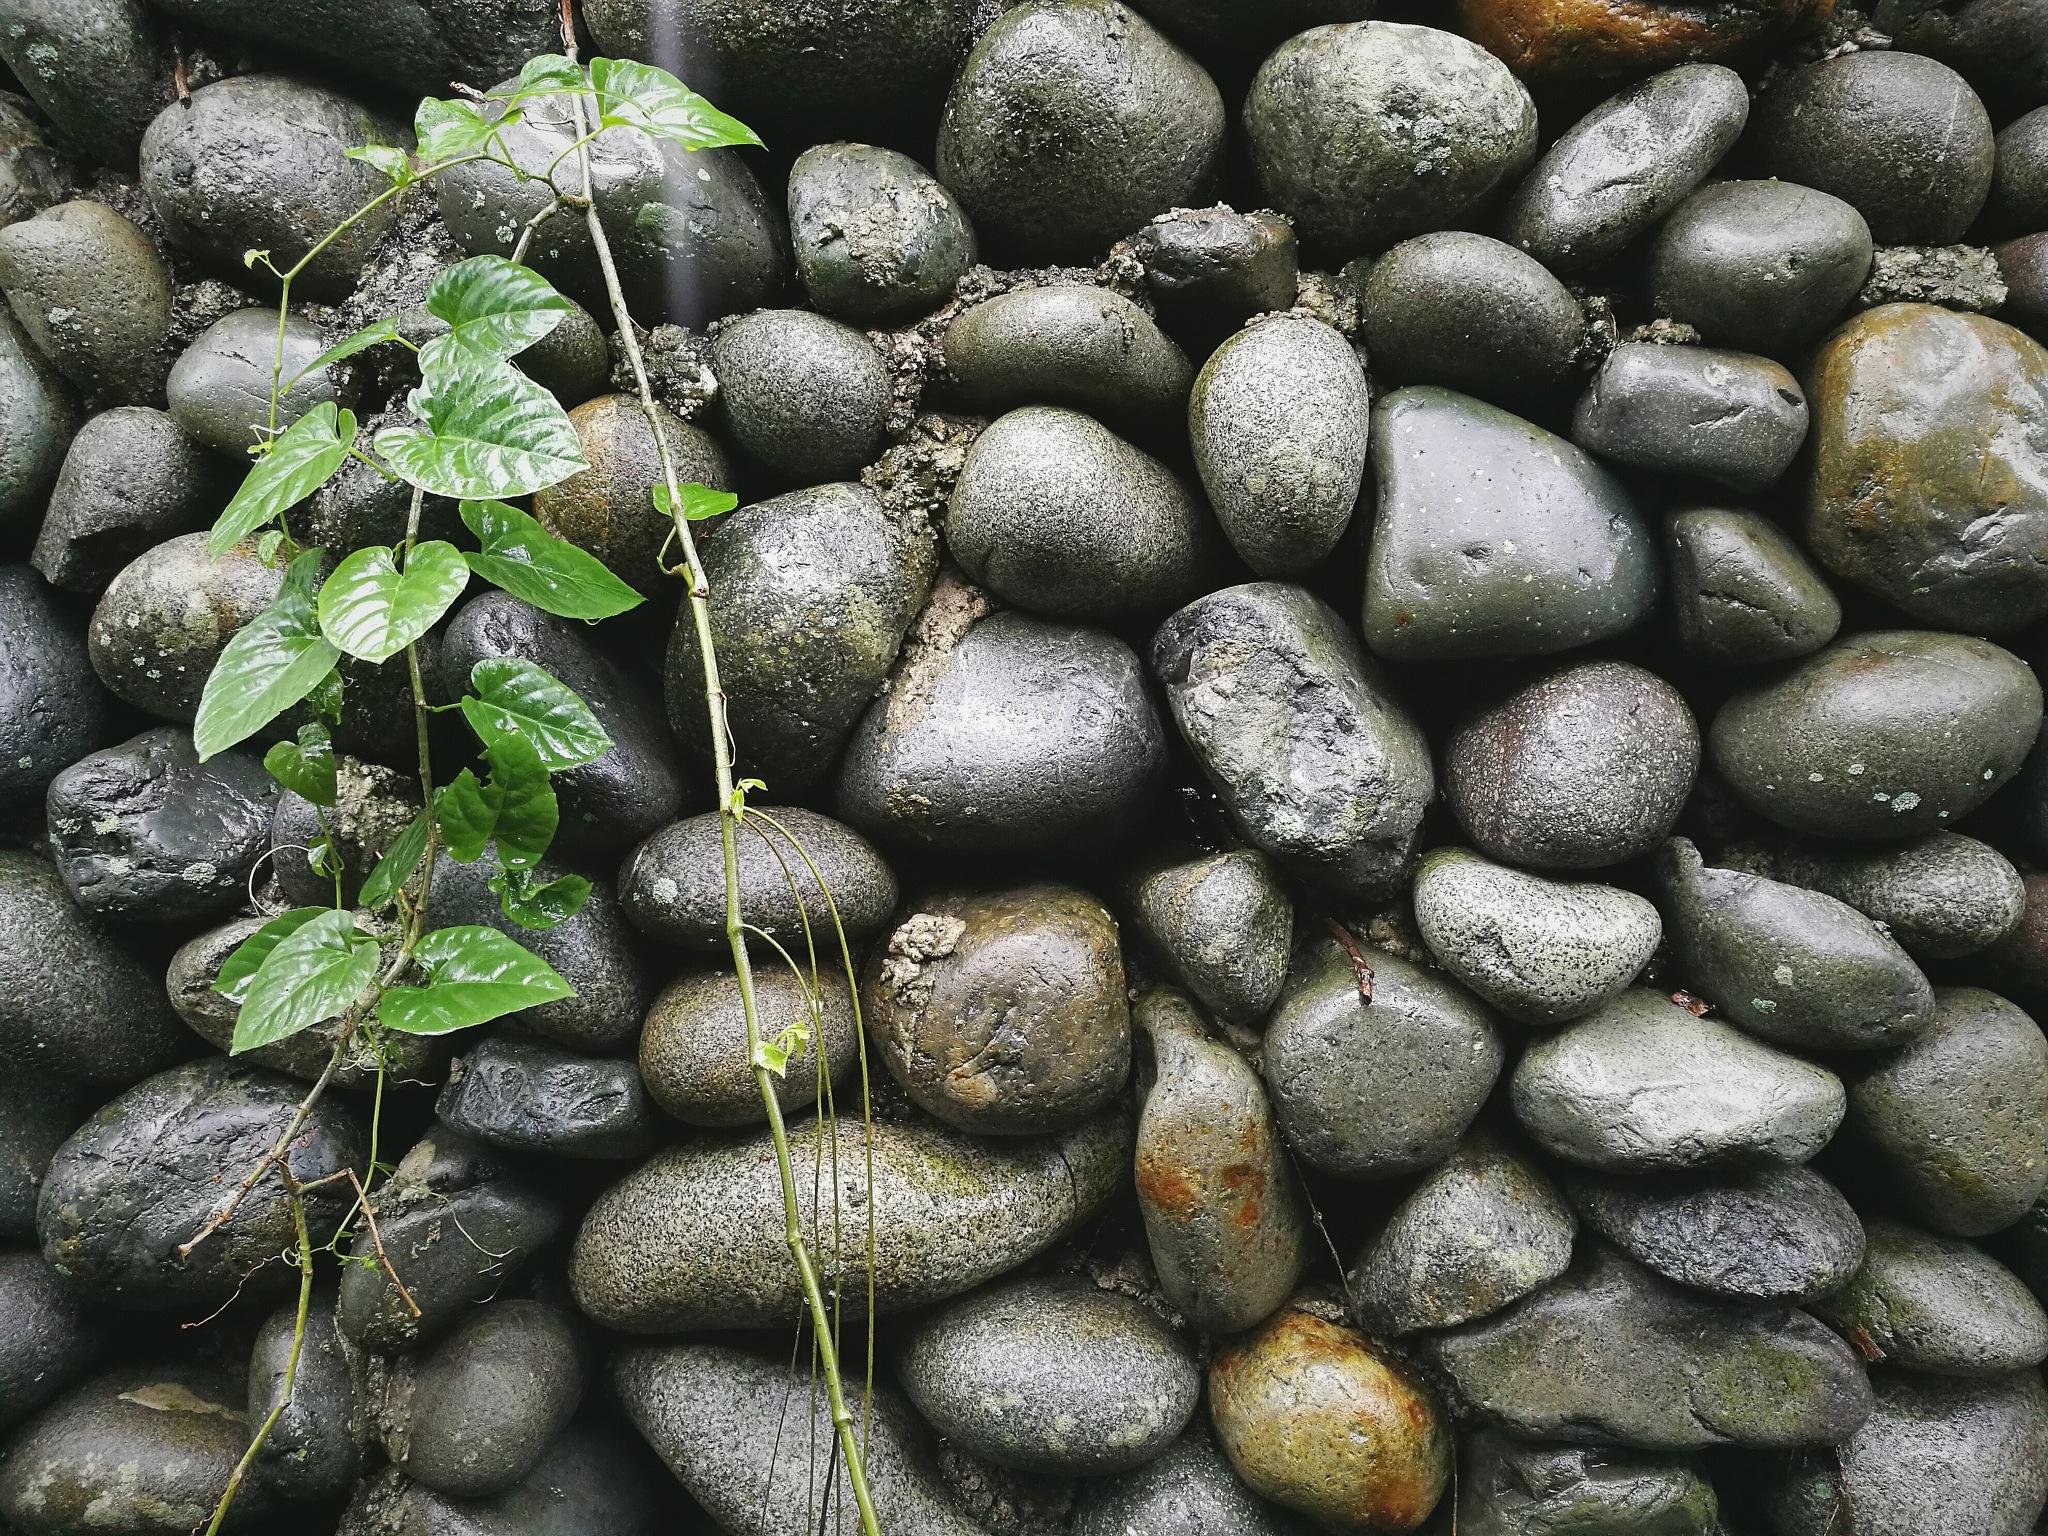 Stoned by Nicolo Nimor